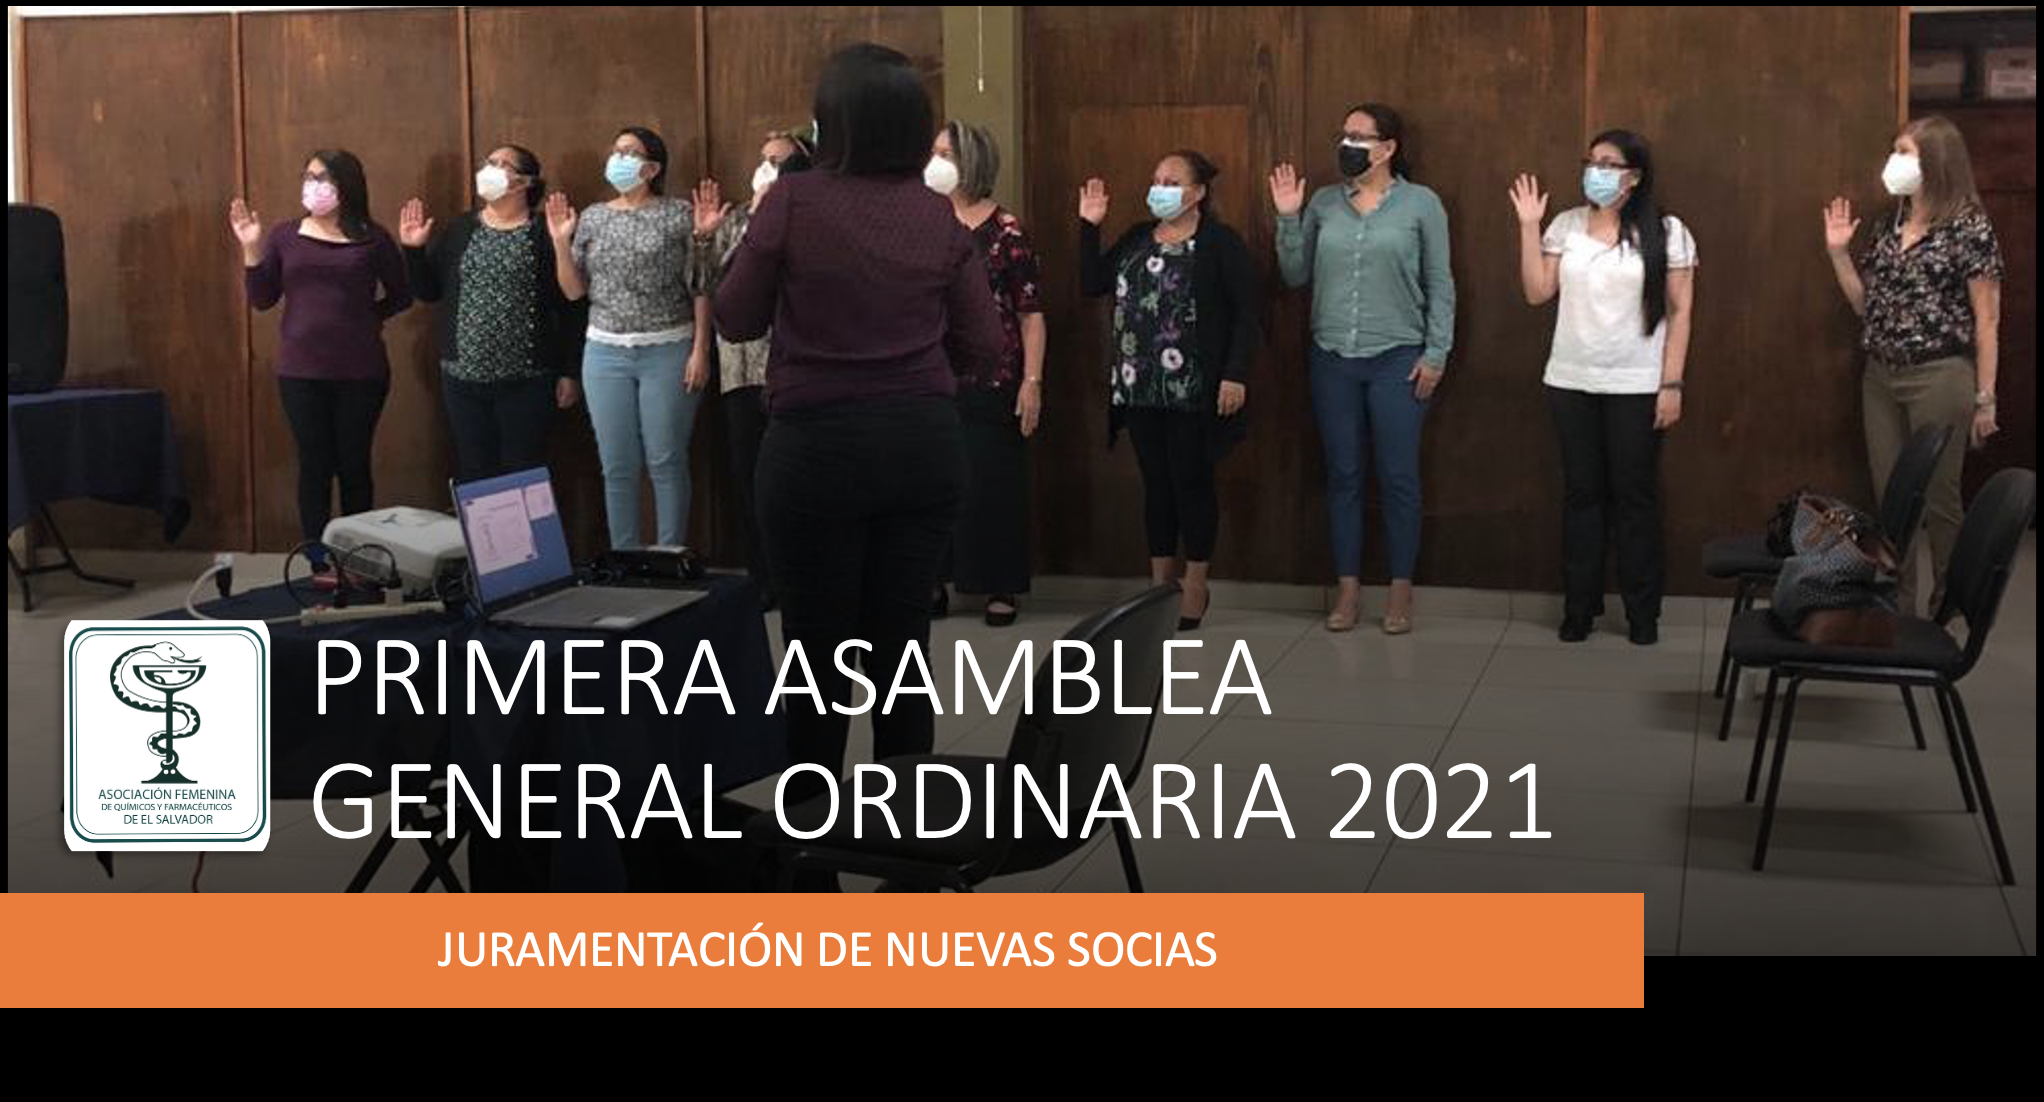 ASAMBLEA GENERAL ORDINARIA  01-2021